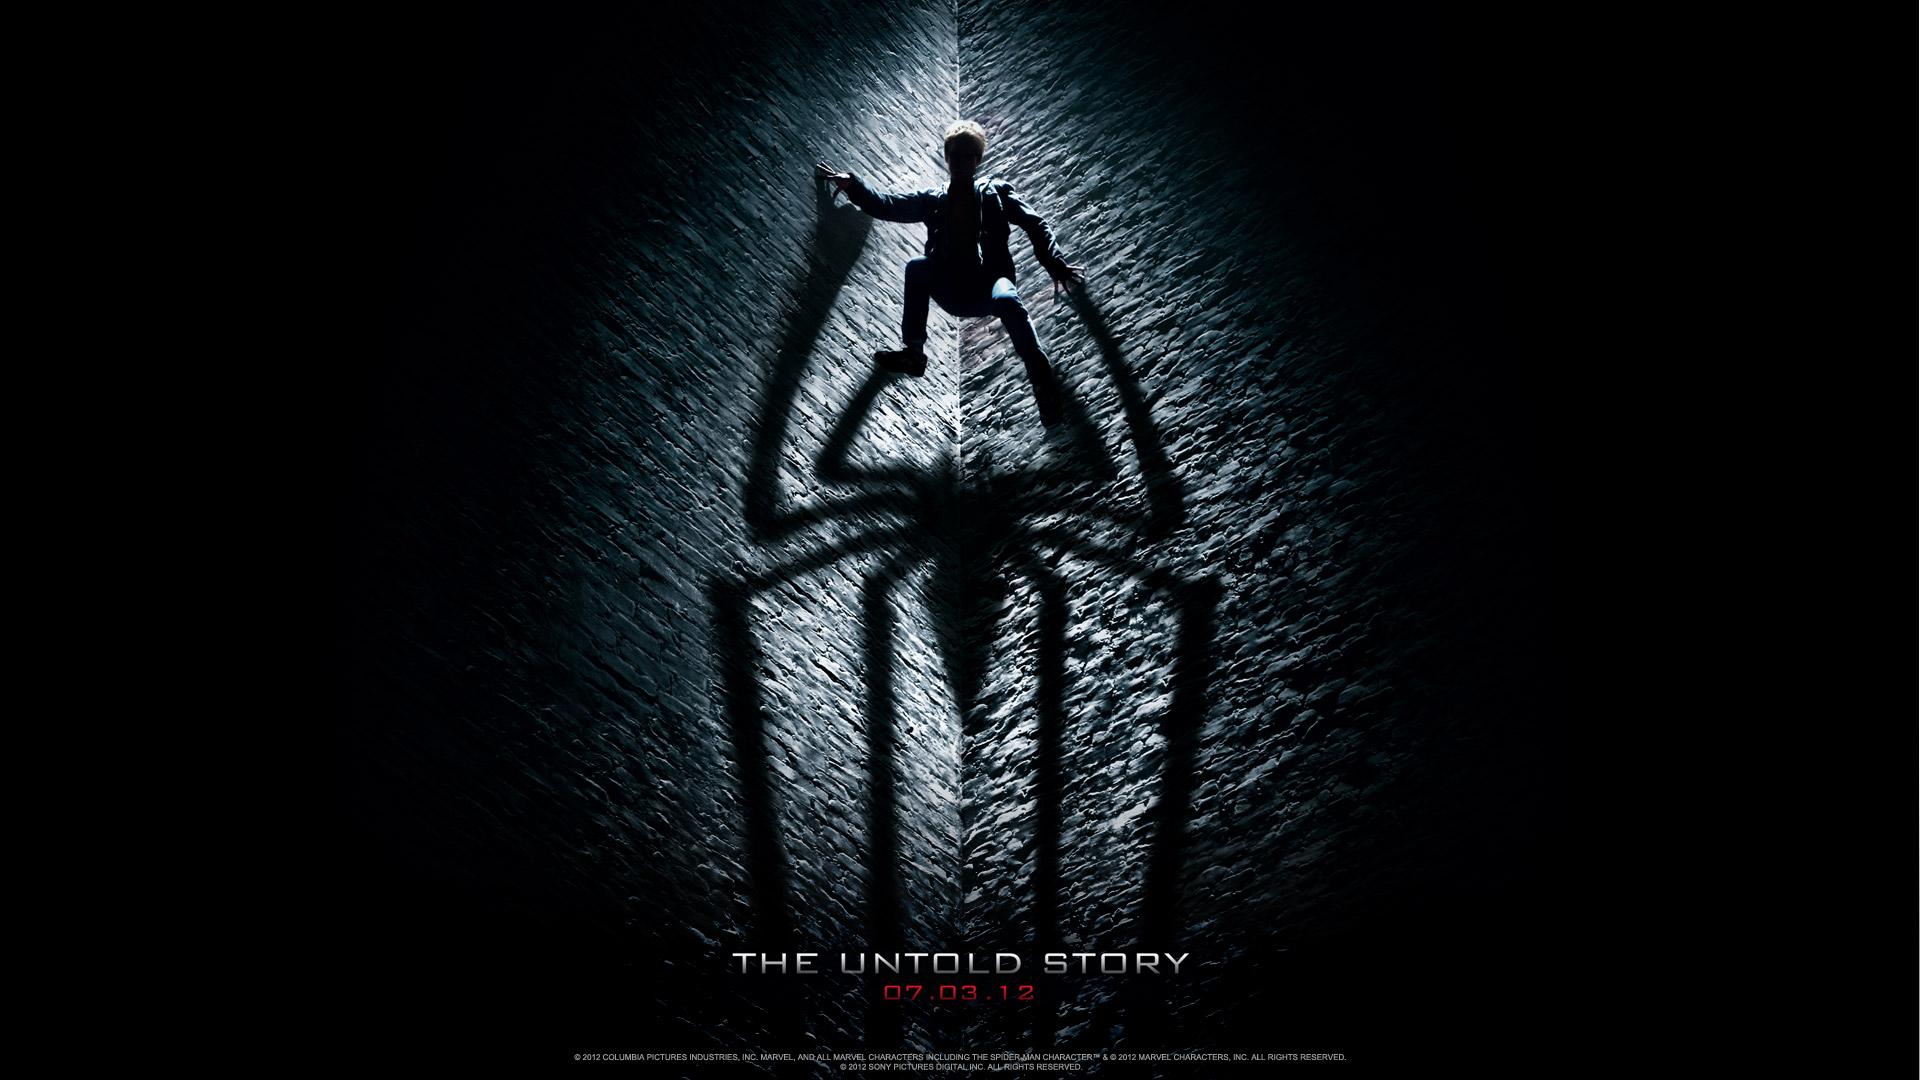 The Amazing Spider Man 2012 wallpaper HD Mastimasaalacom 1920x1080